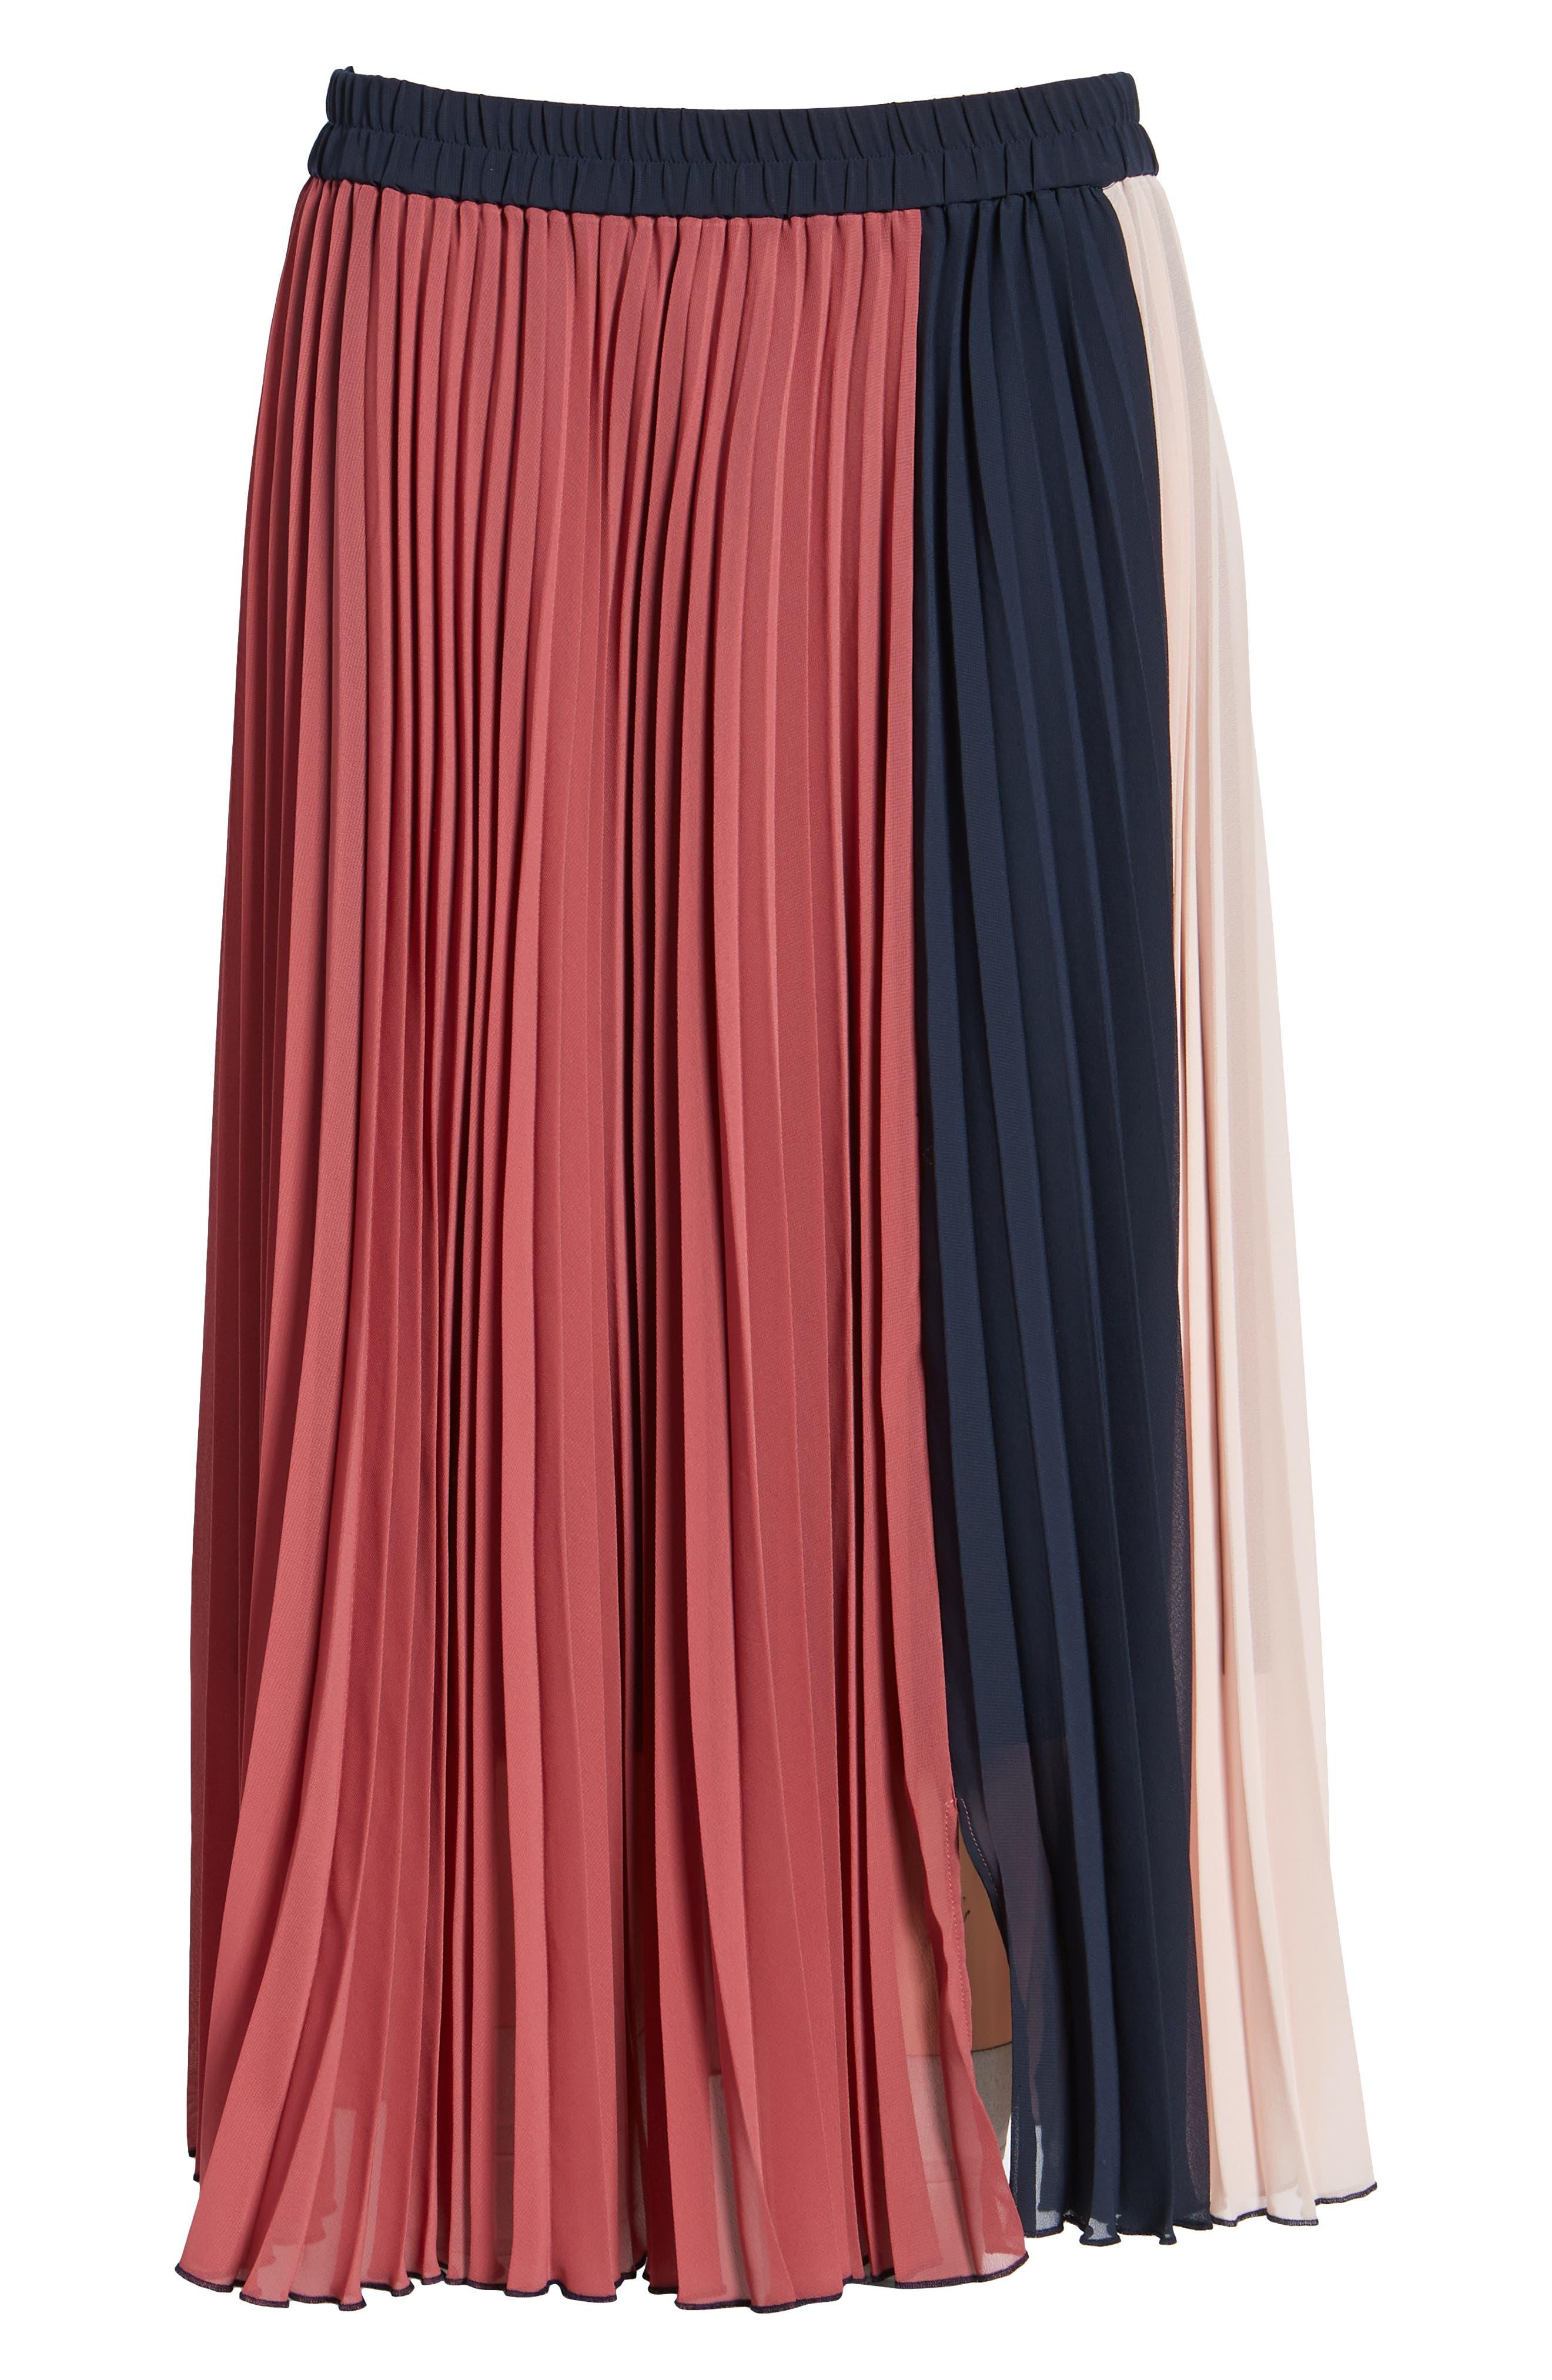 x Atlantic-Pacific Colorblock Pleated Midi Skirt,                             Alternate thumbnail 7, color,                             PINK- NAVY COLORBLOCK